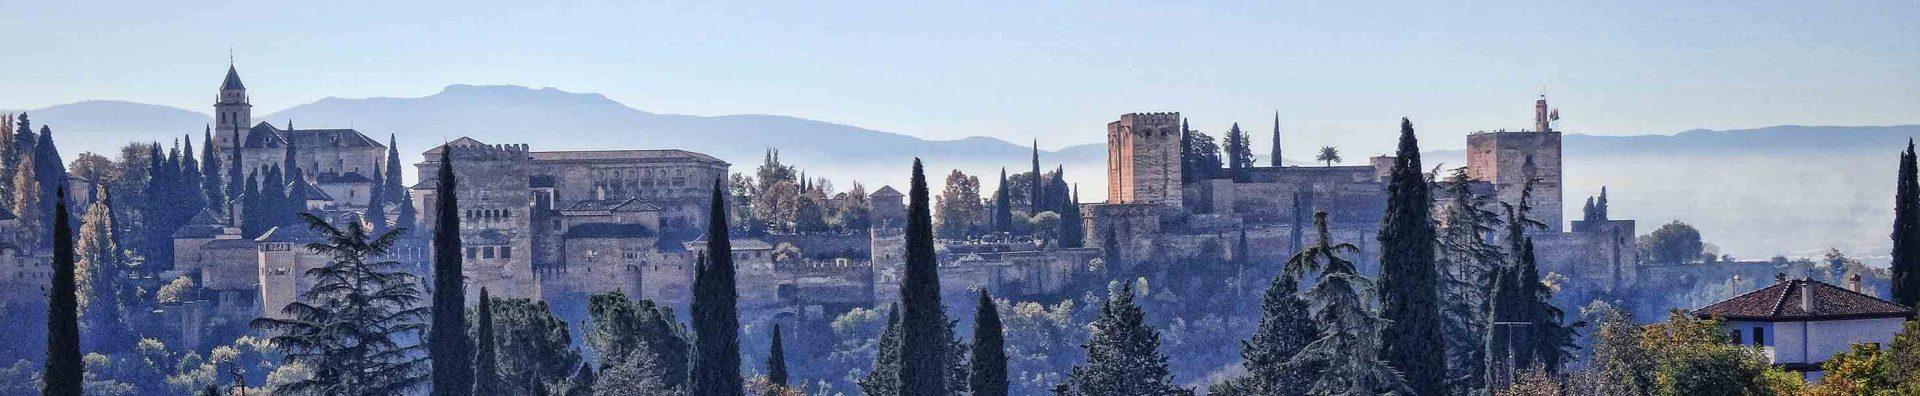 Visita guiada completa a la Alhambra 1